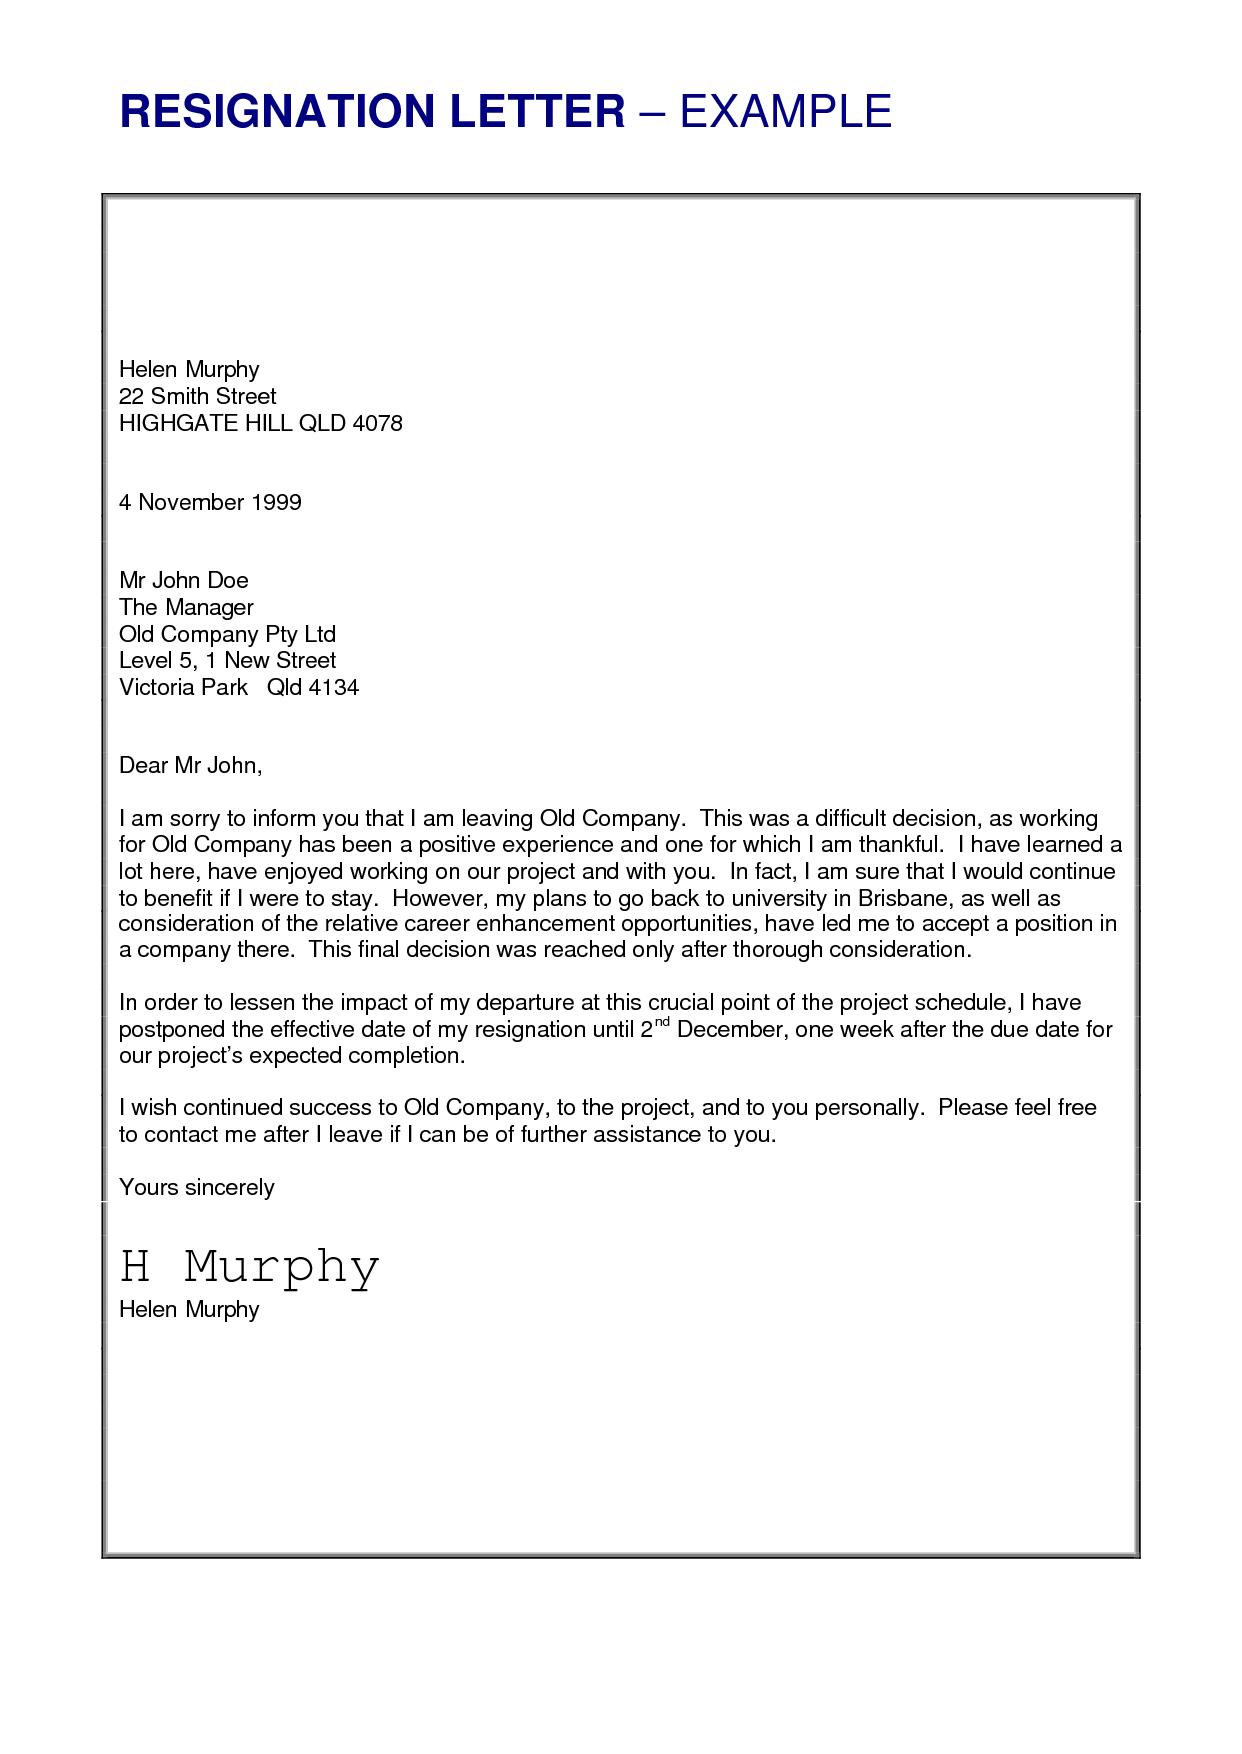 Free Resignation Letter Template Microsoft Word Download - Job Resignation Letter Sample Loganun Blog Job